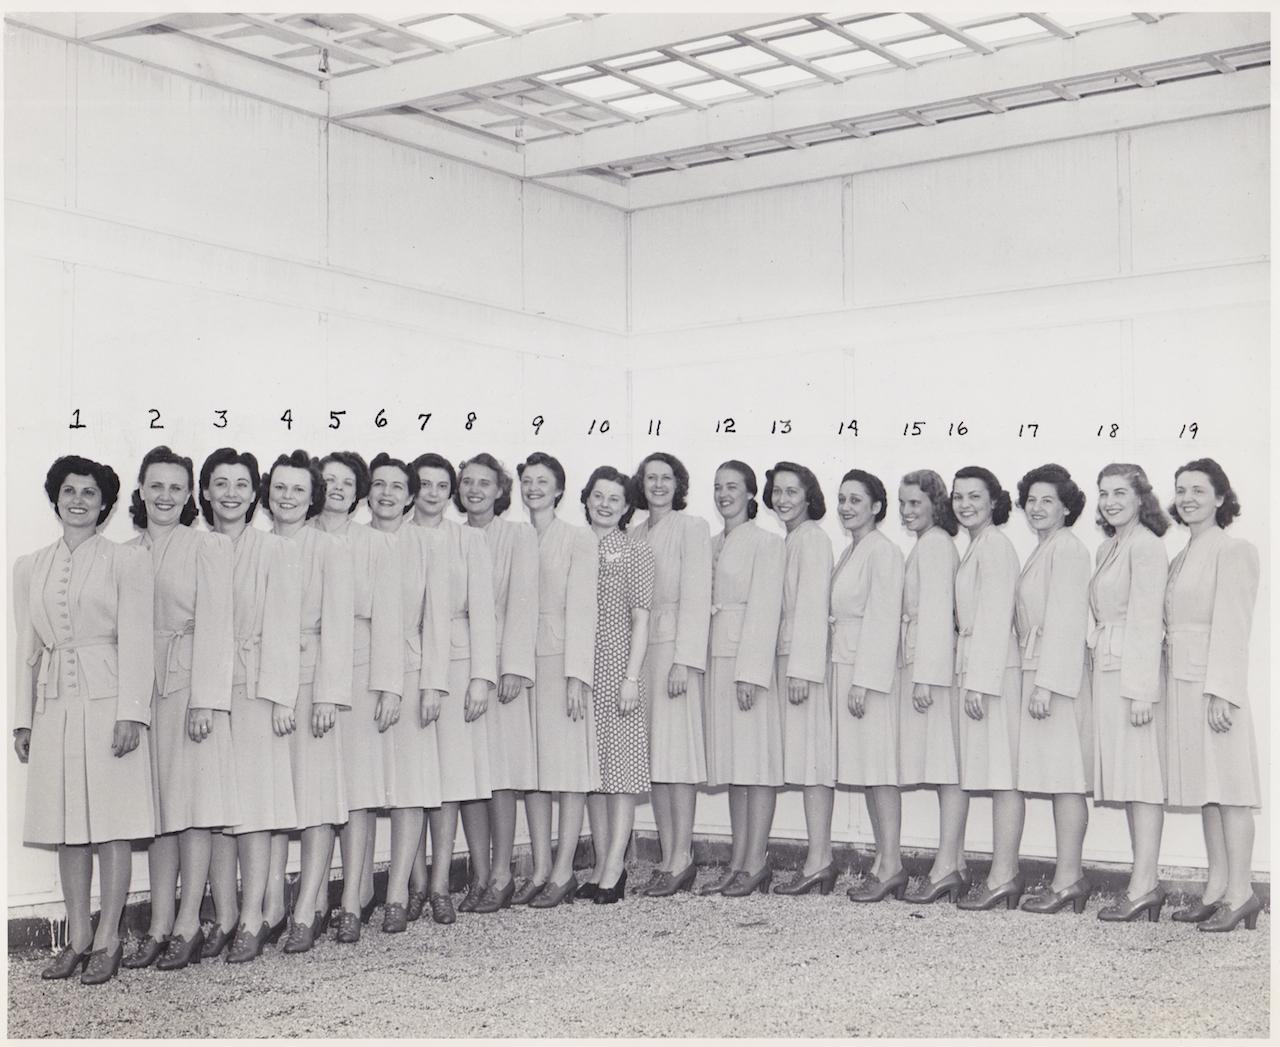 The Press Department Bell Telephone Department, New York World's Fair, 1939